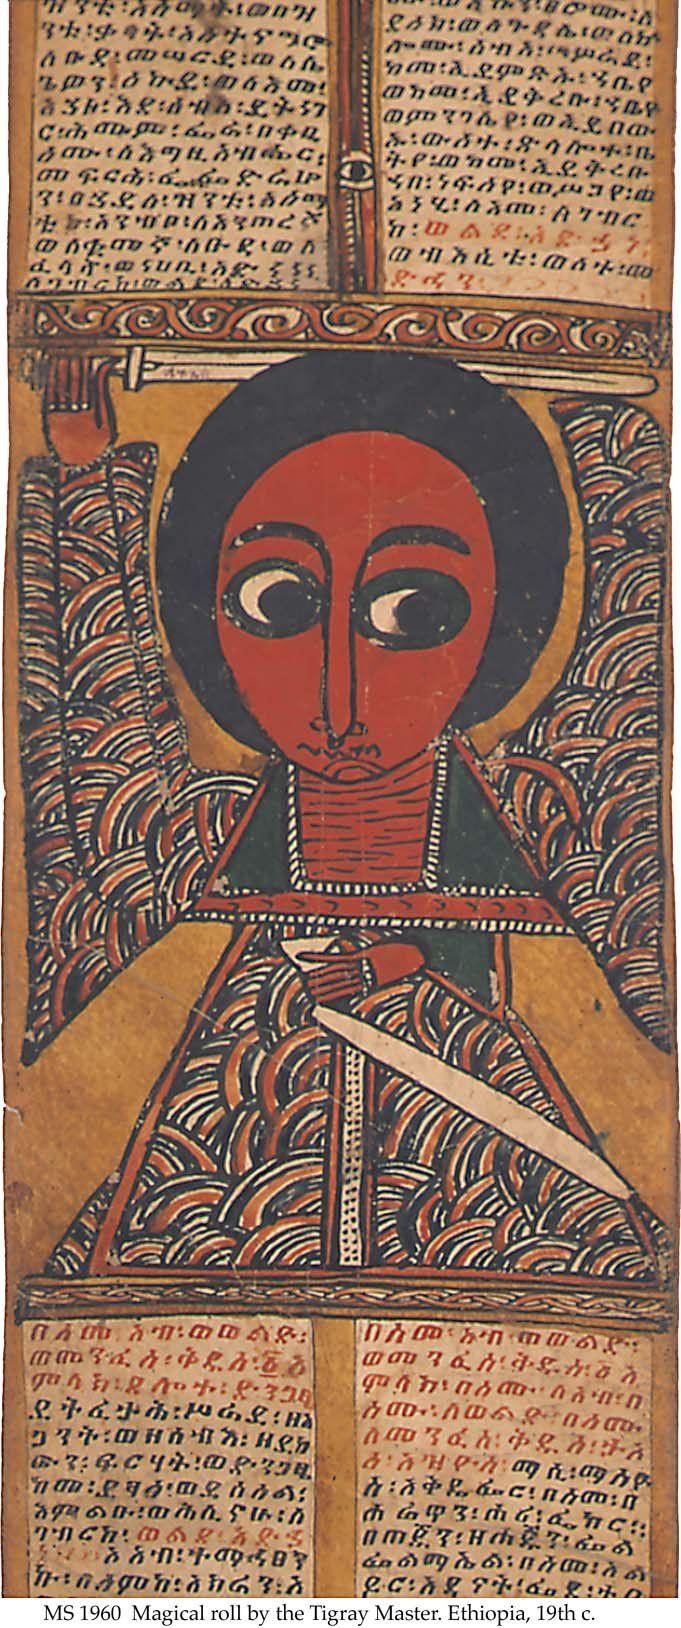 Ethiopia Magical roll by Tigray Master - 19th c Provenance: 1. Walda Adhana, Tigray, Ethiopia (19th c. -); 2. Sam Fogg Collection, London, B31.